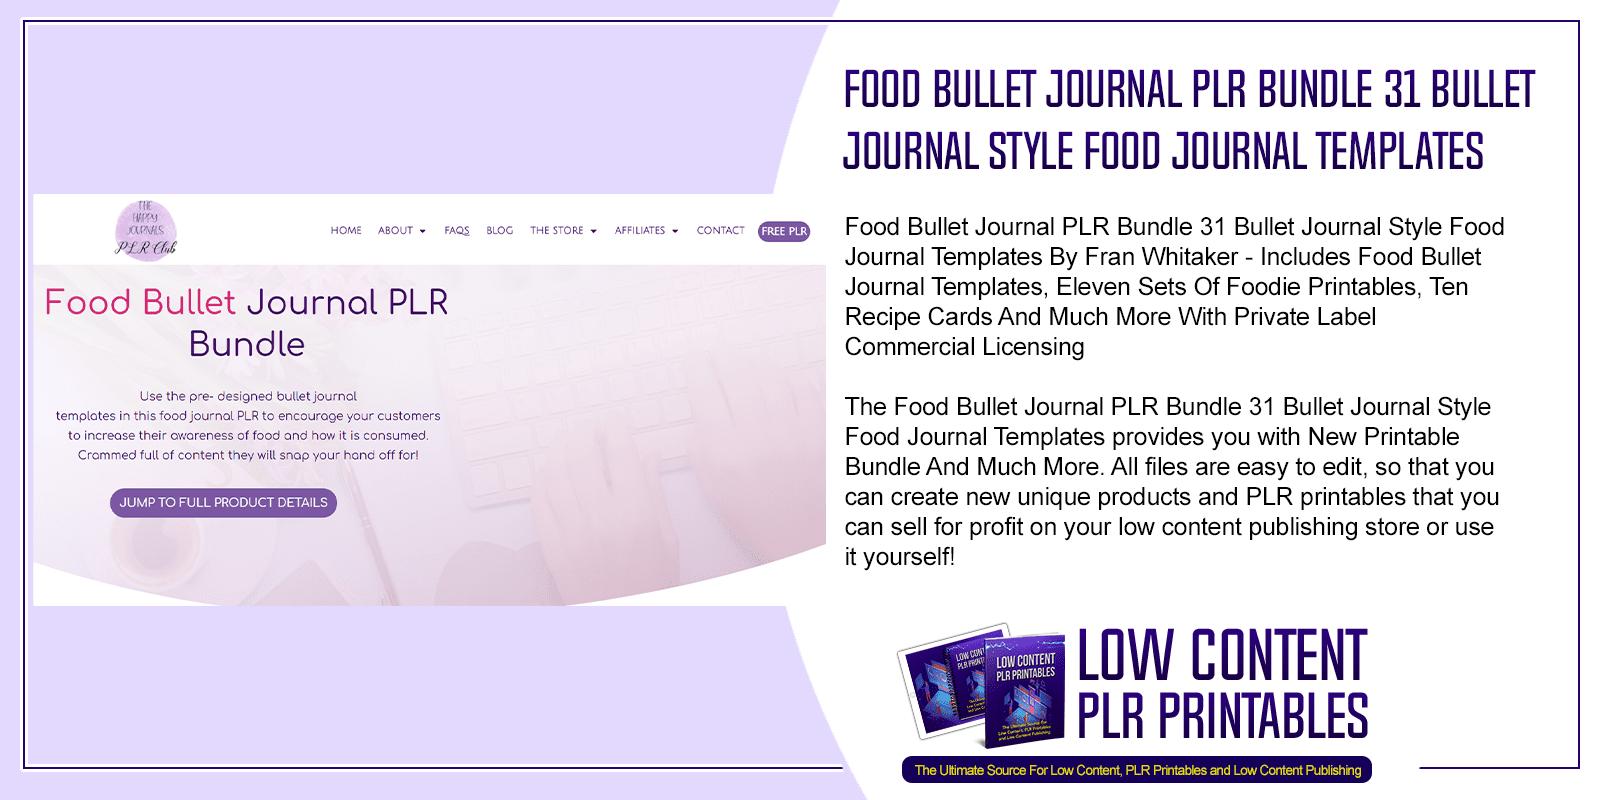 Food Bullet Journal PLR Bundle 31 Bullet Journal Style Food Journal Templates